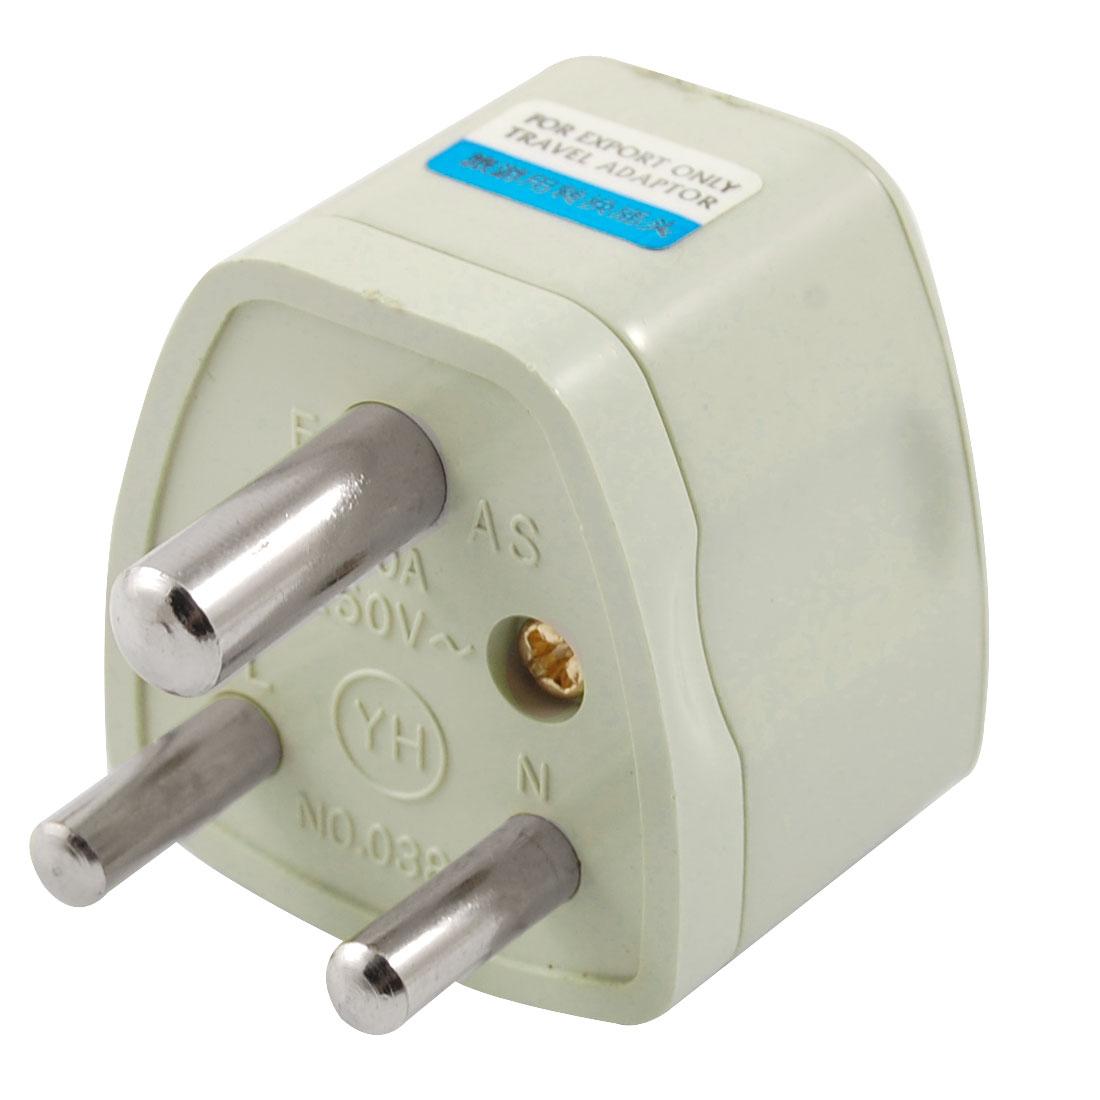 Small South Africa Plug AC 250V to EU US AU UK Socket Travel Adapter